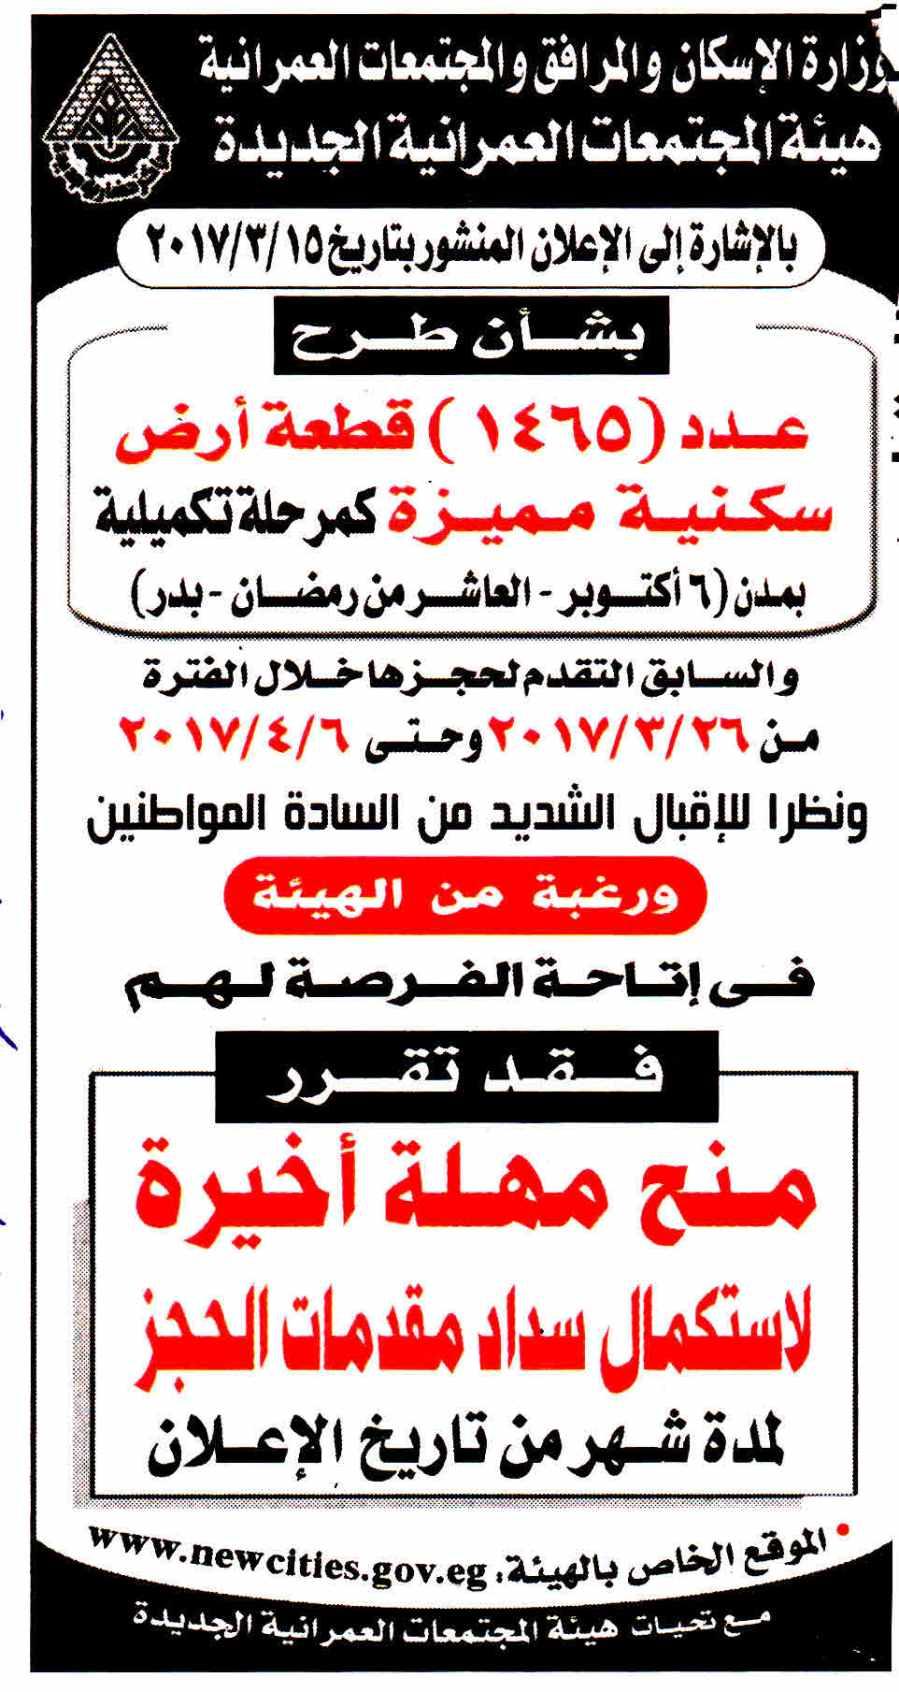 Al Akhbar 1 Nov P.3.jpg